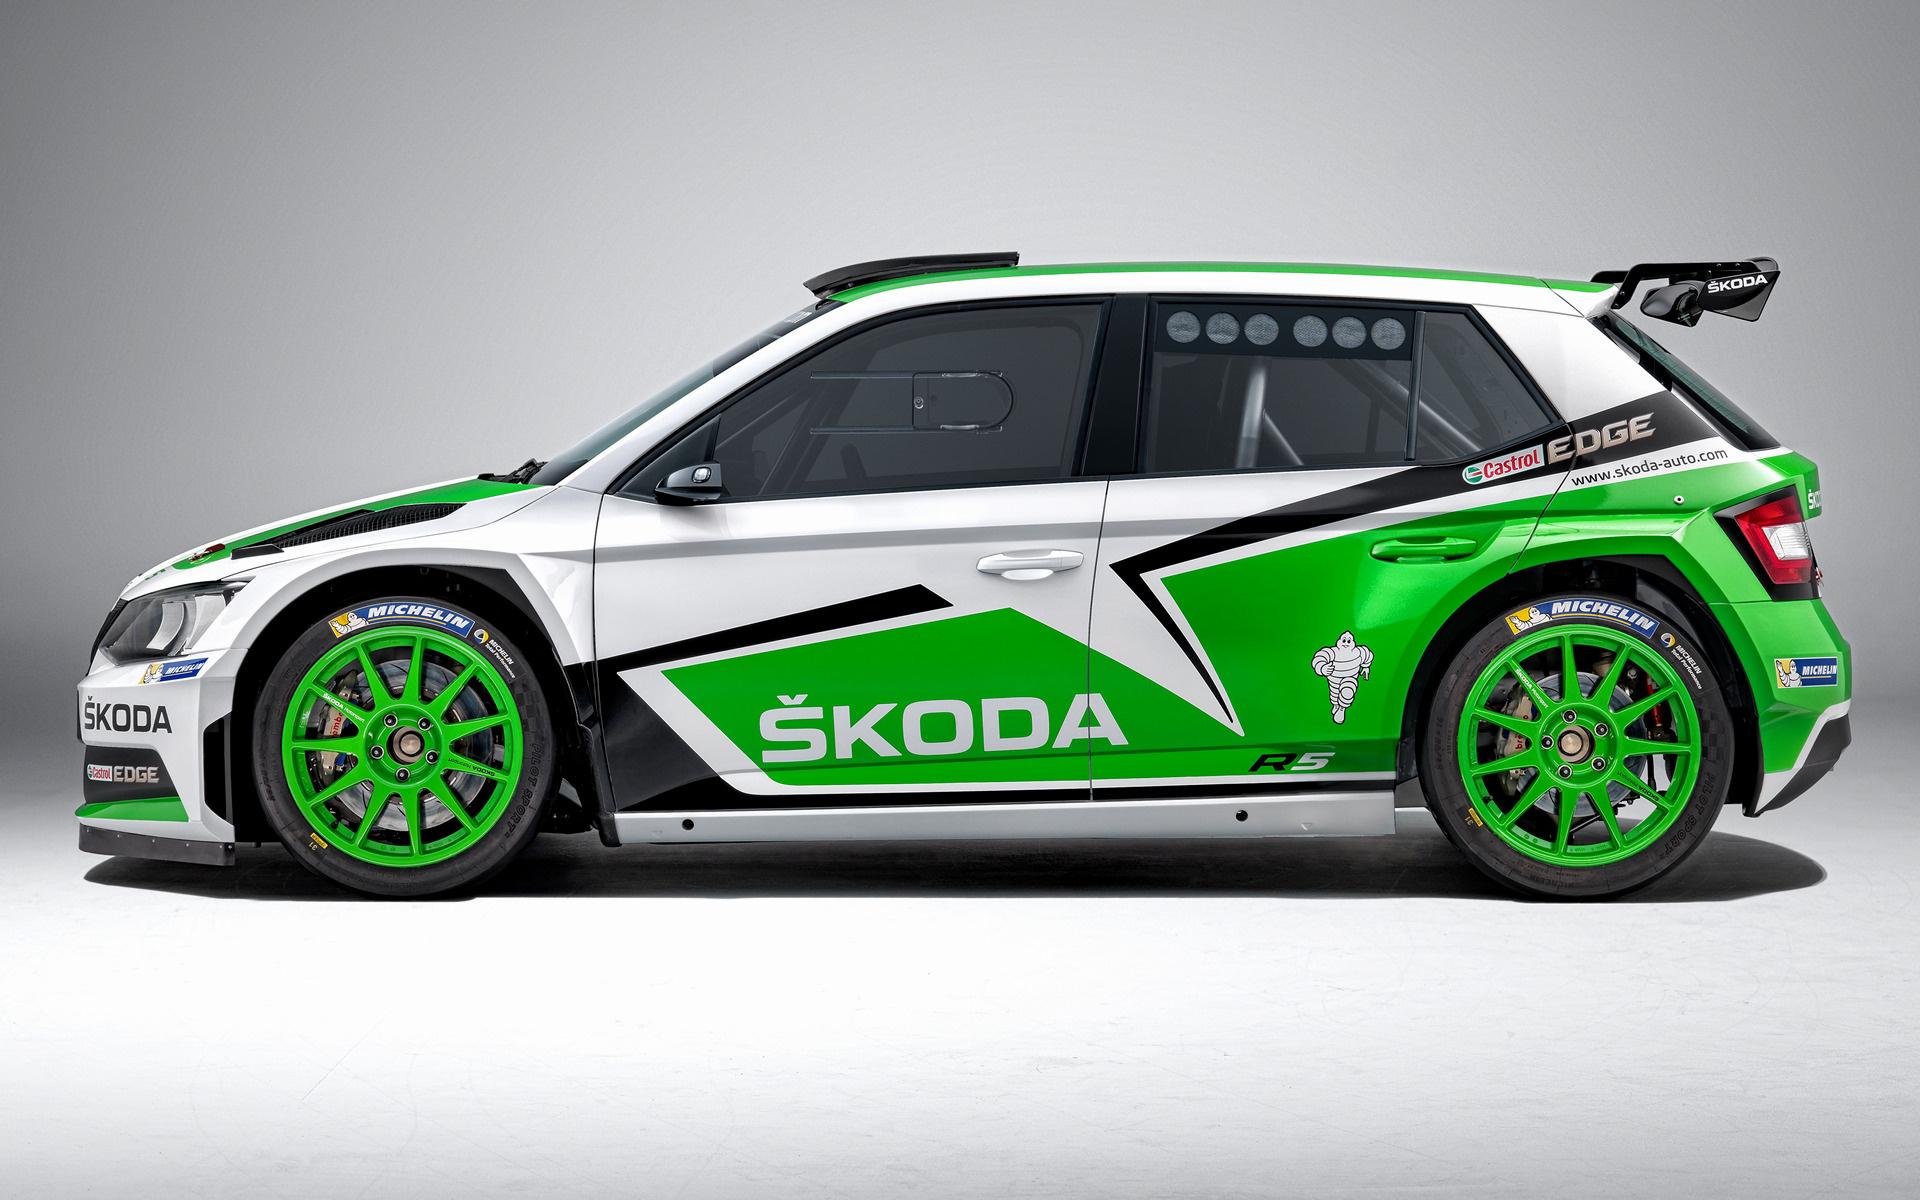 2015 Skoda Fabia R5 Wallpapers And Hd Images Car Pixel